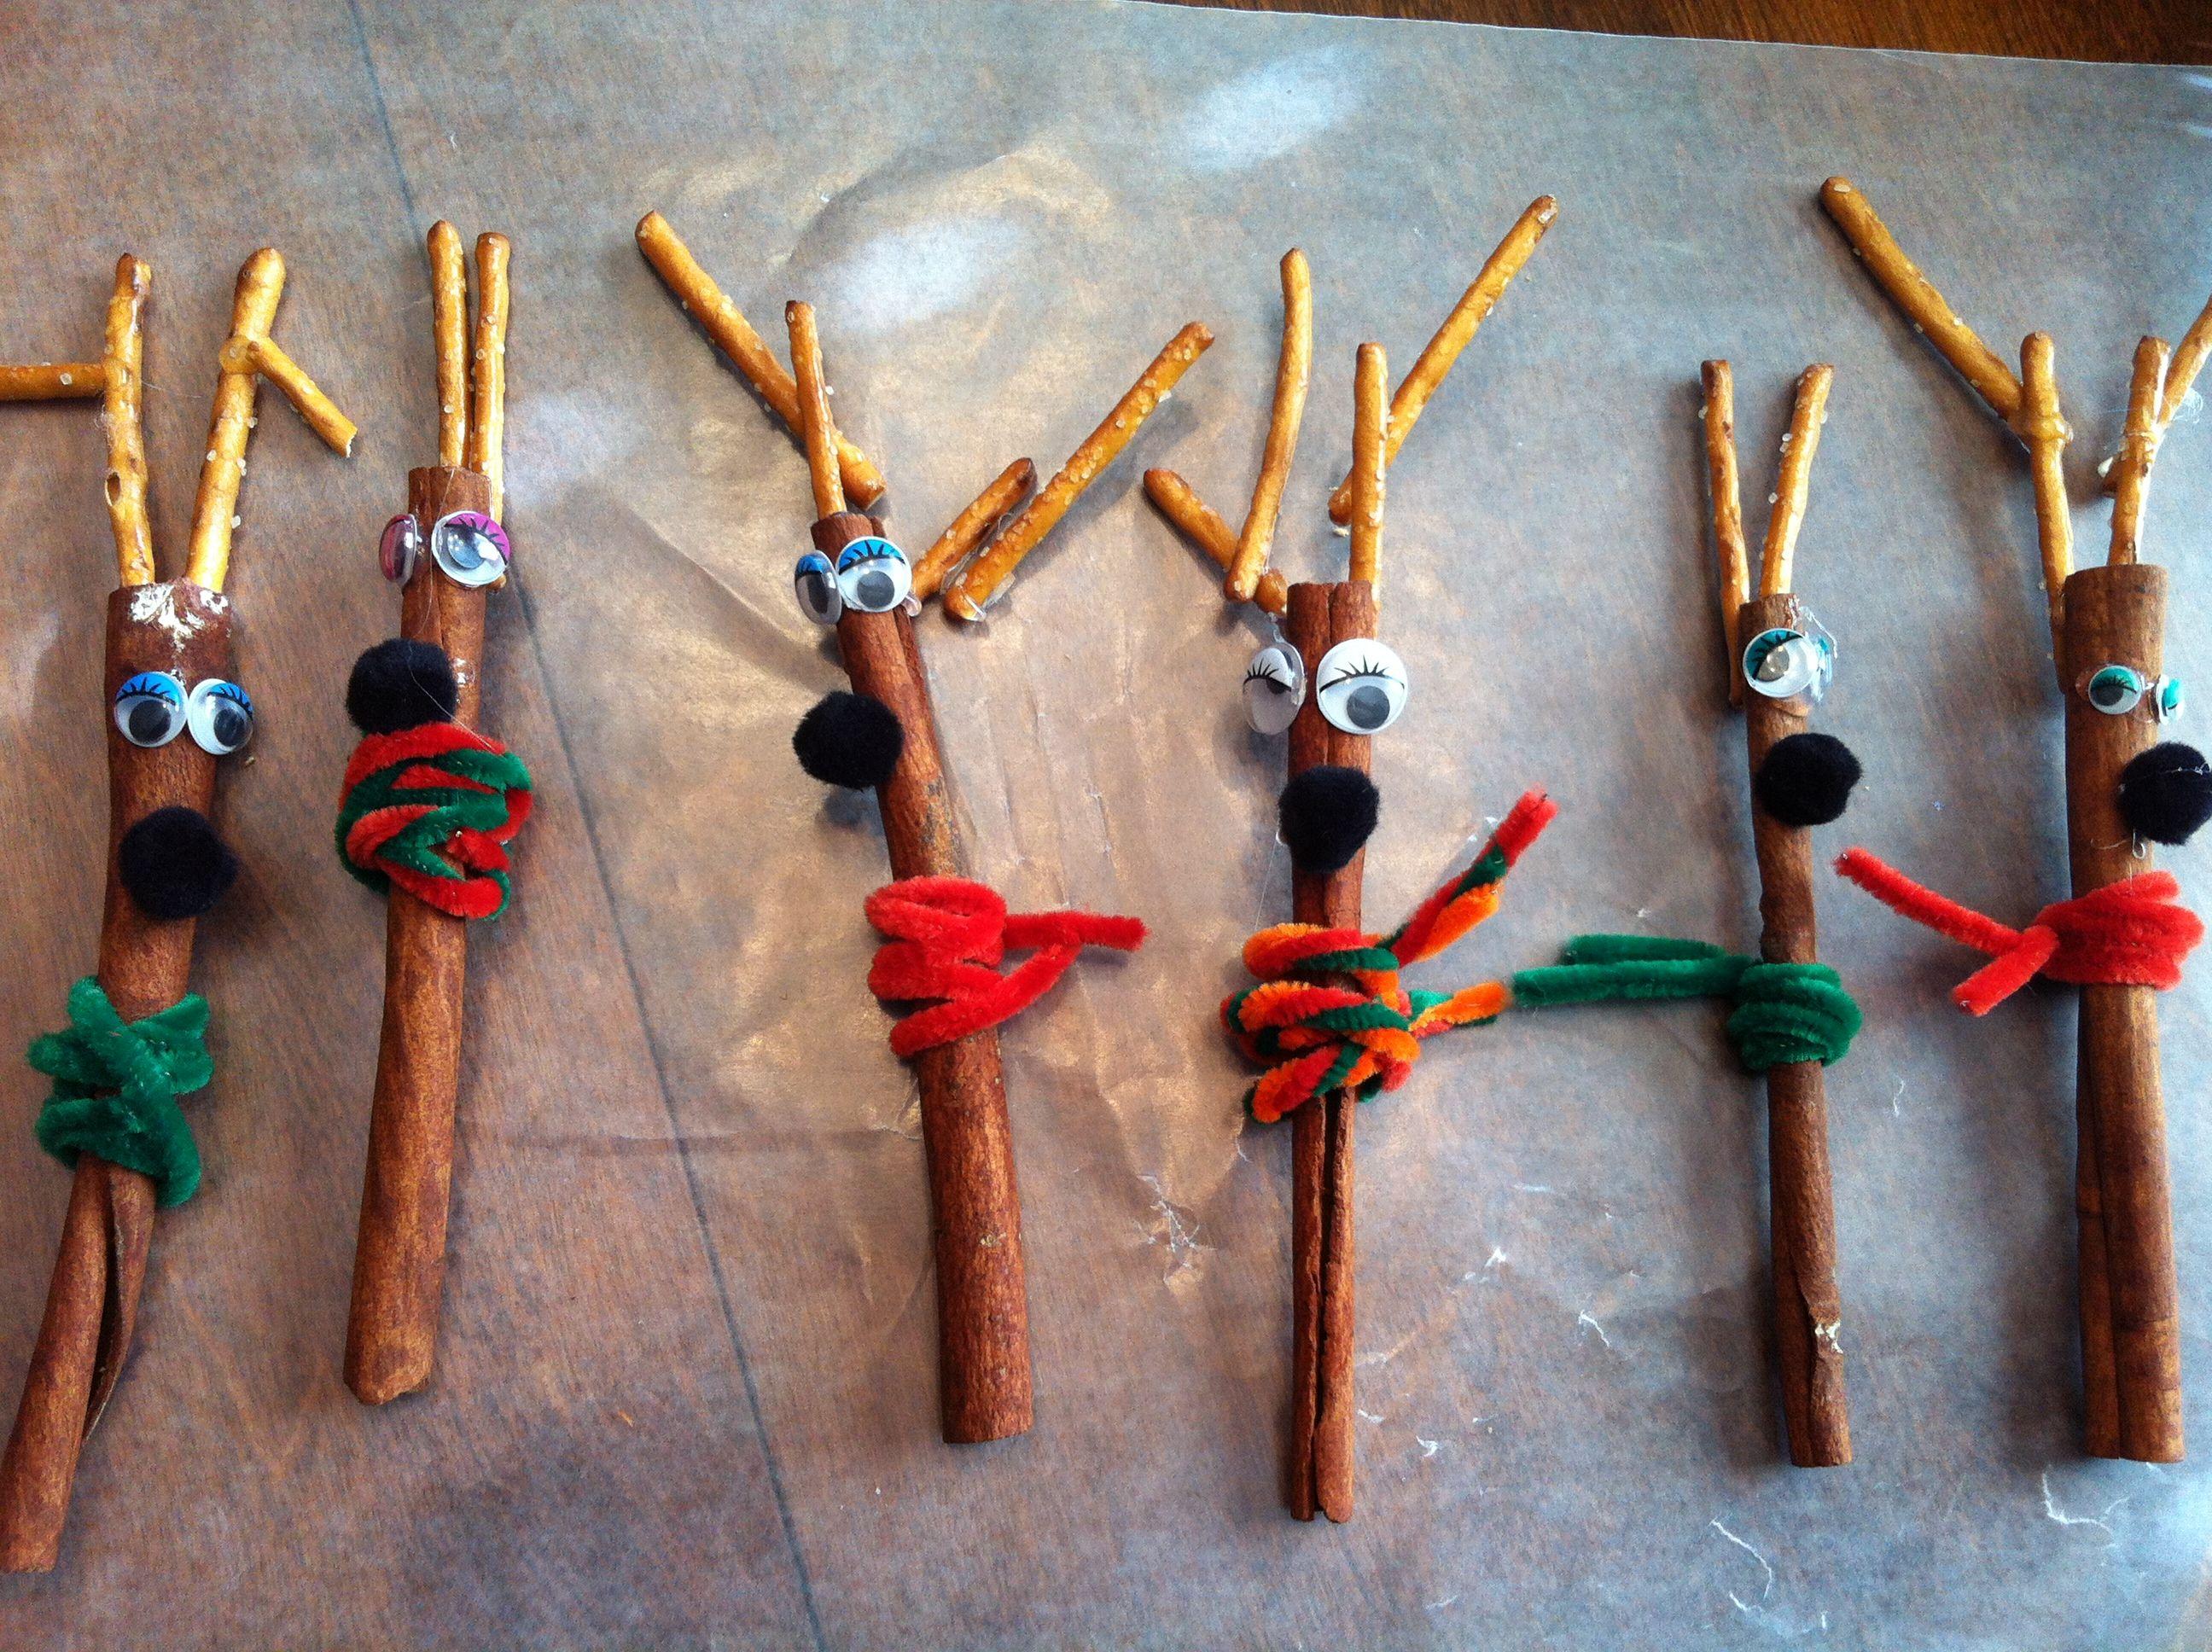 Cinnamon Stick Reindeer Cinnamon Stick Reindeer Reindeer Craft